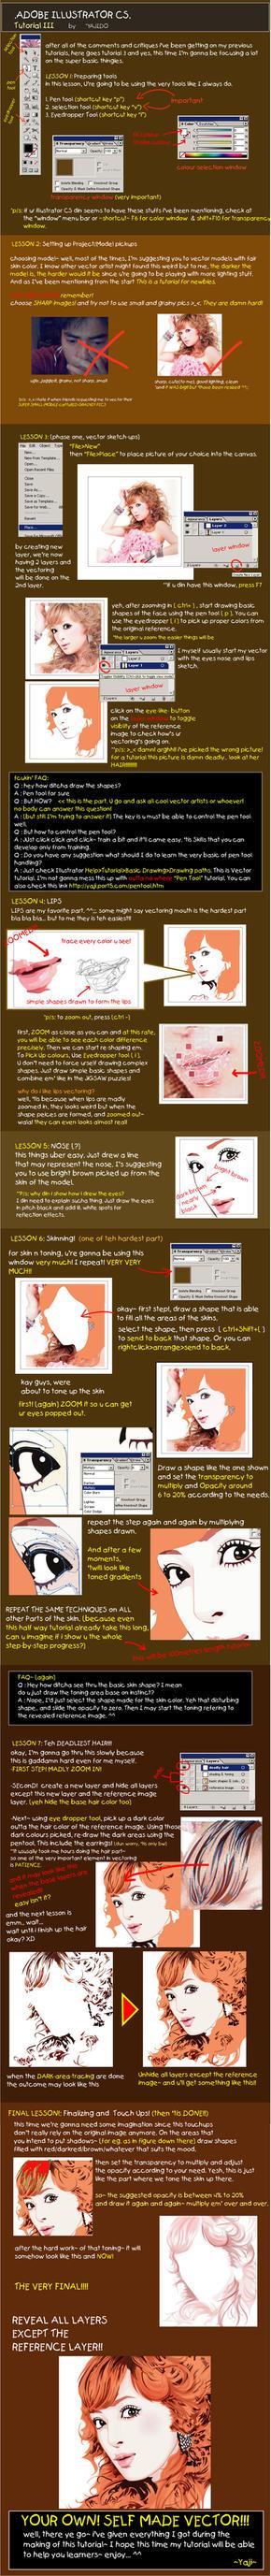 tutorial Illustrator by vectortutorial